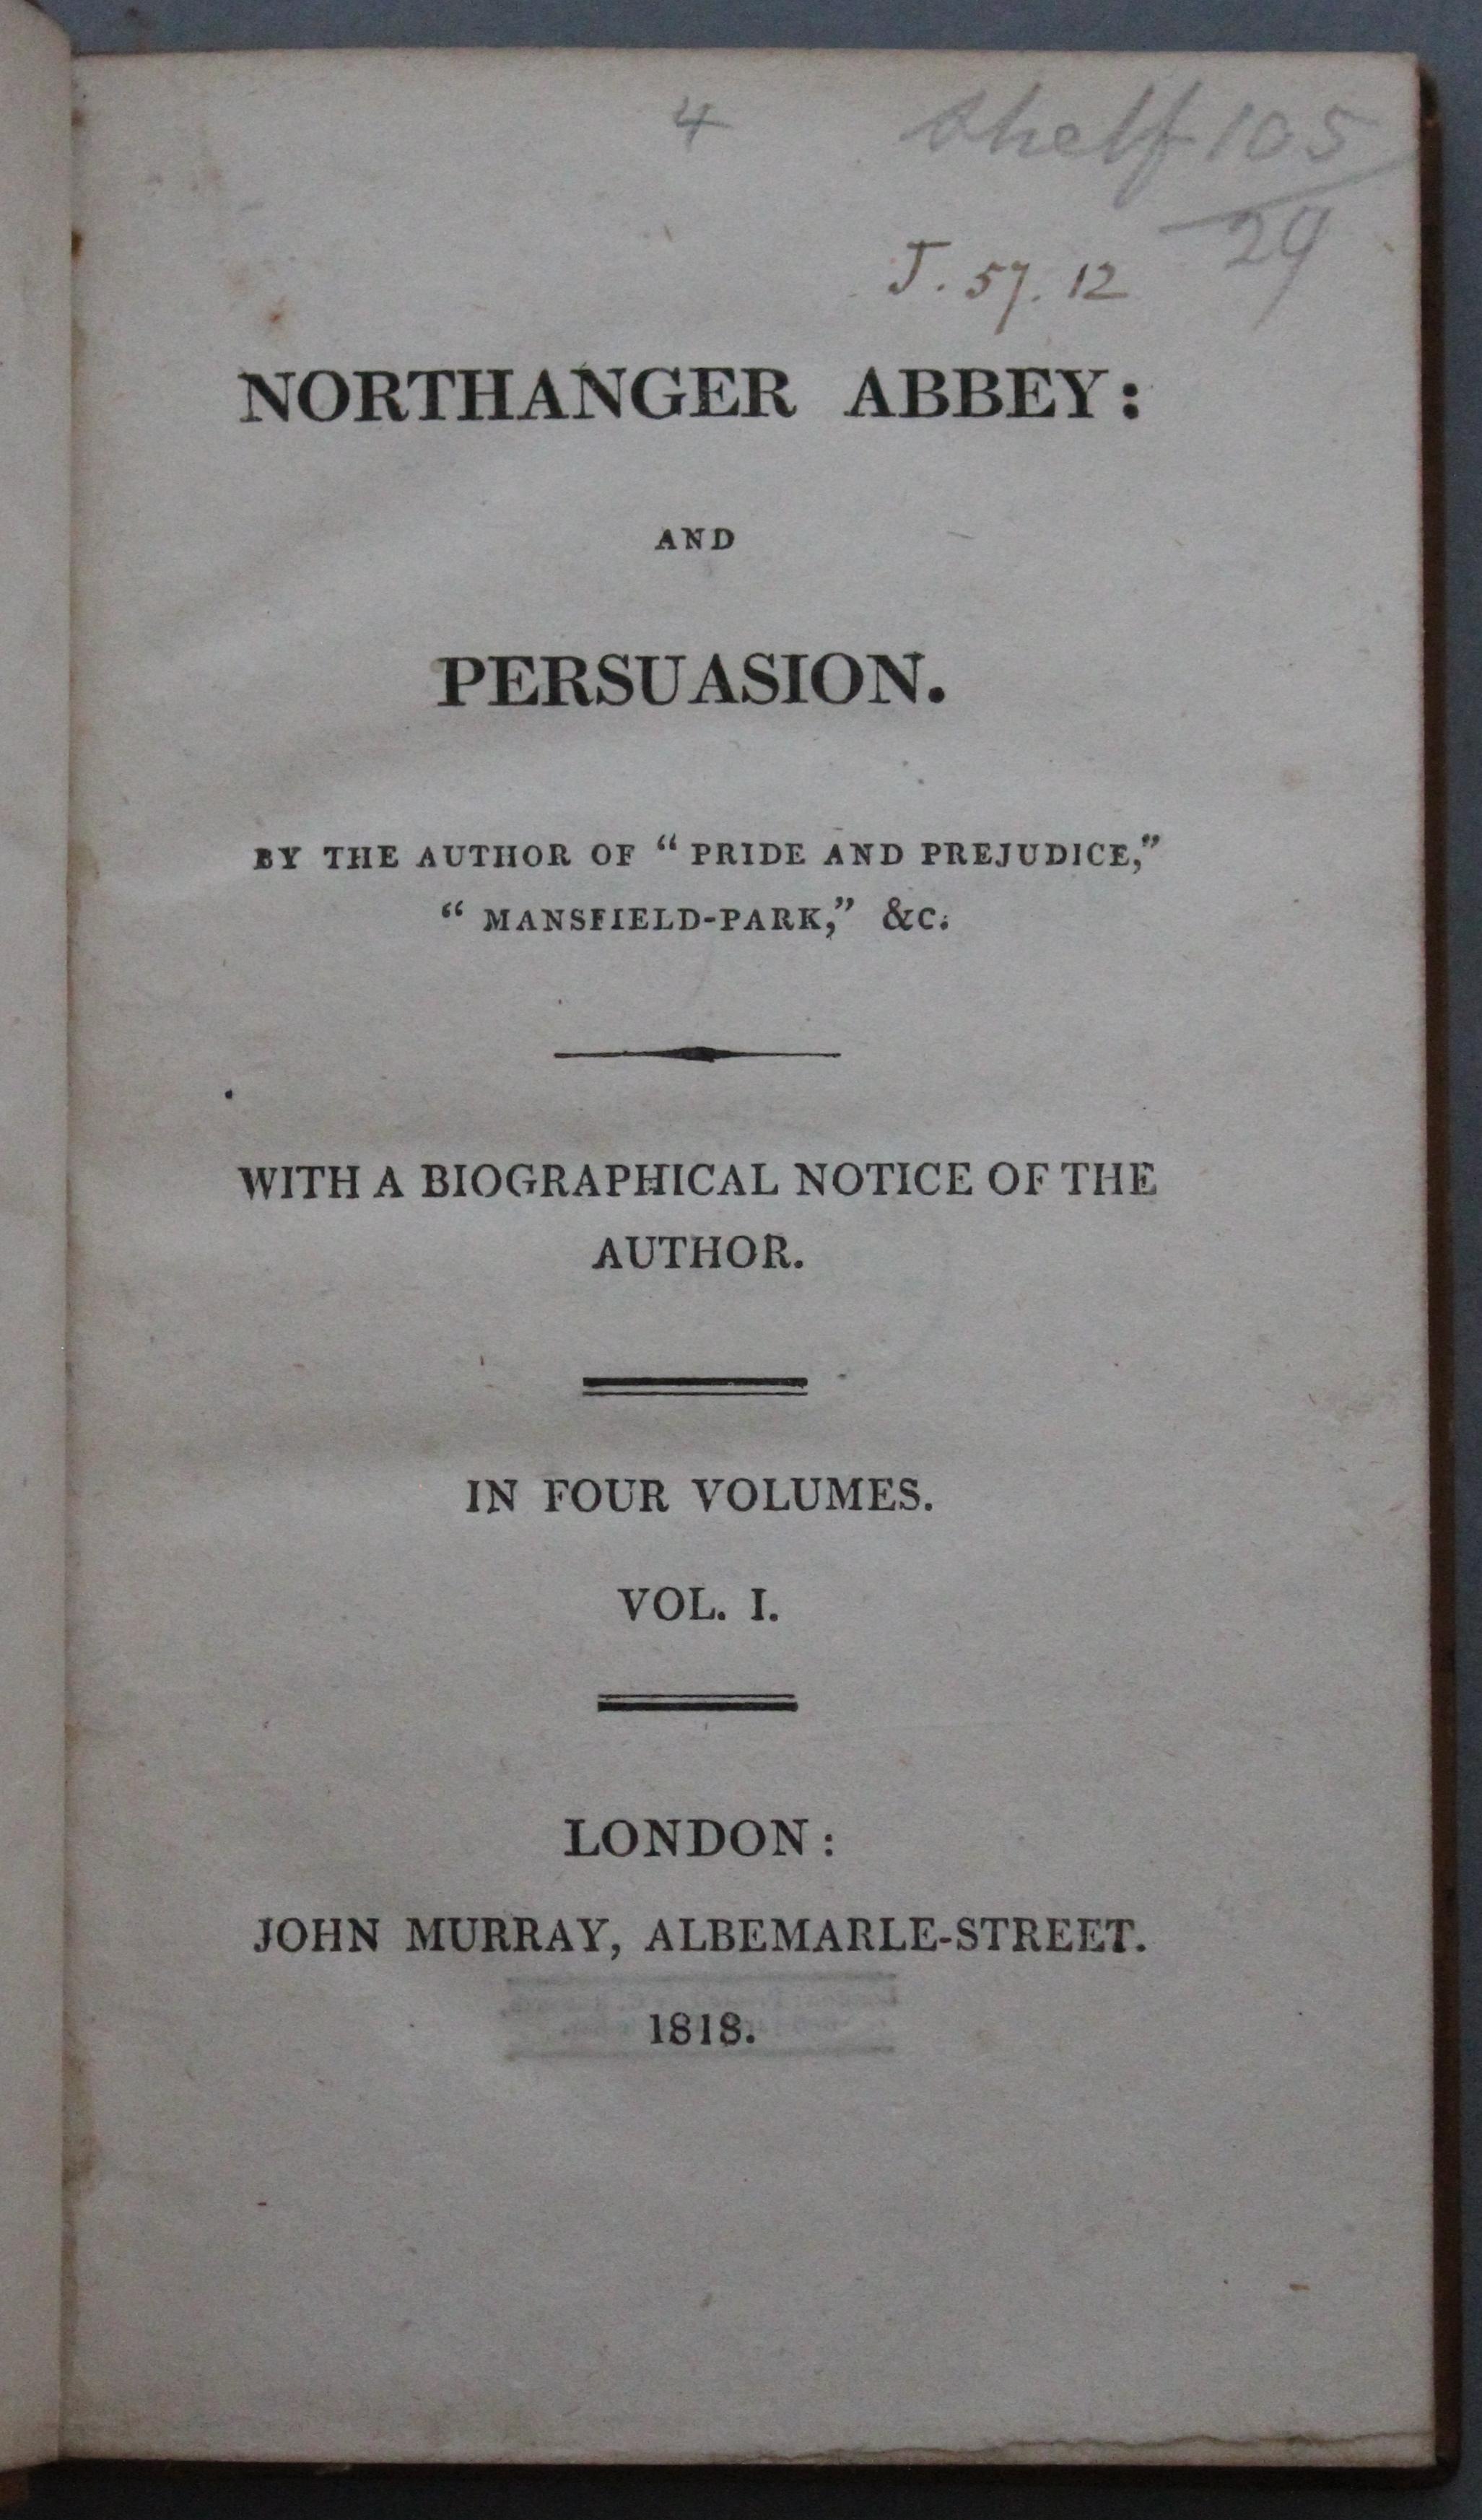 Thackeray.J.57.13 title page